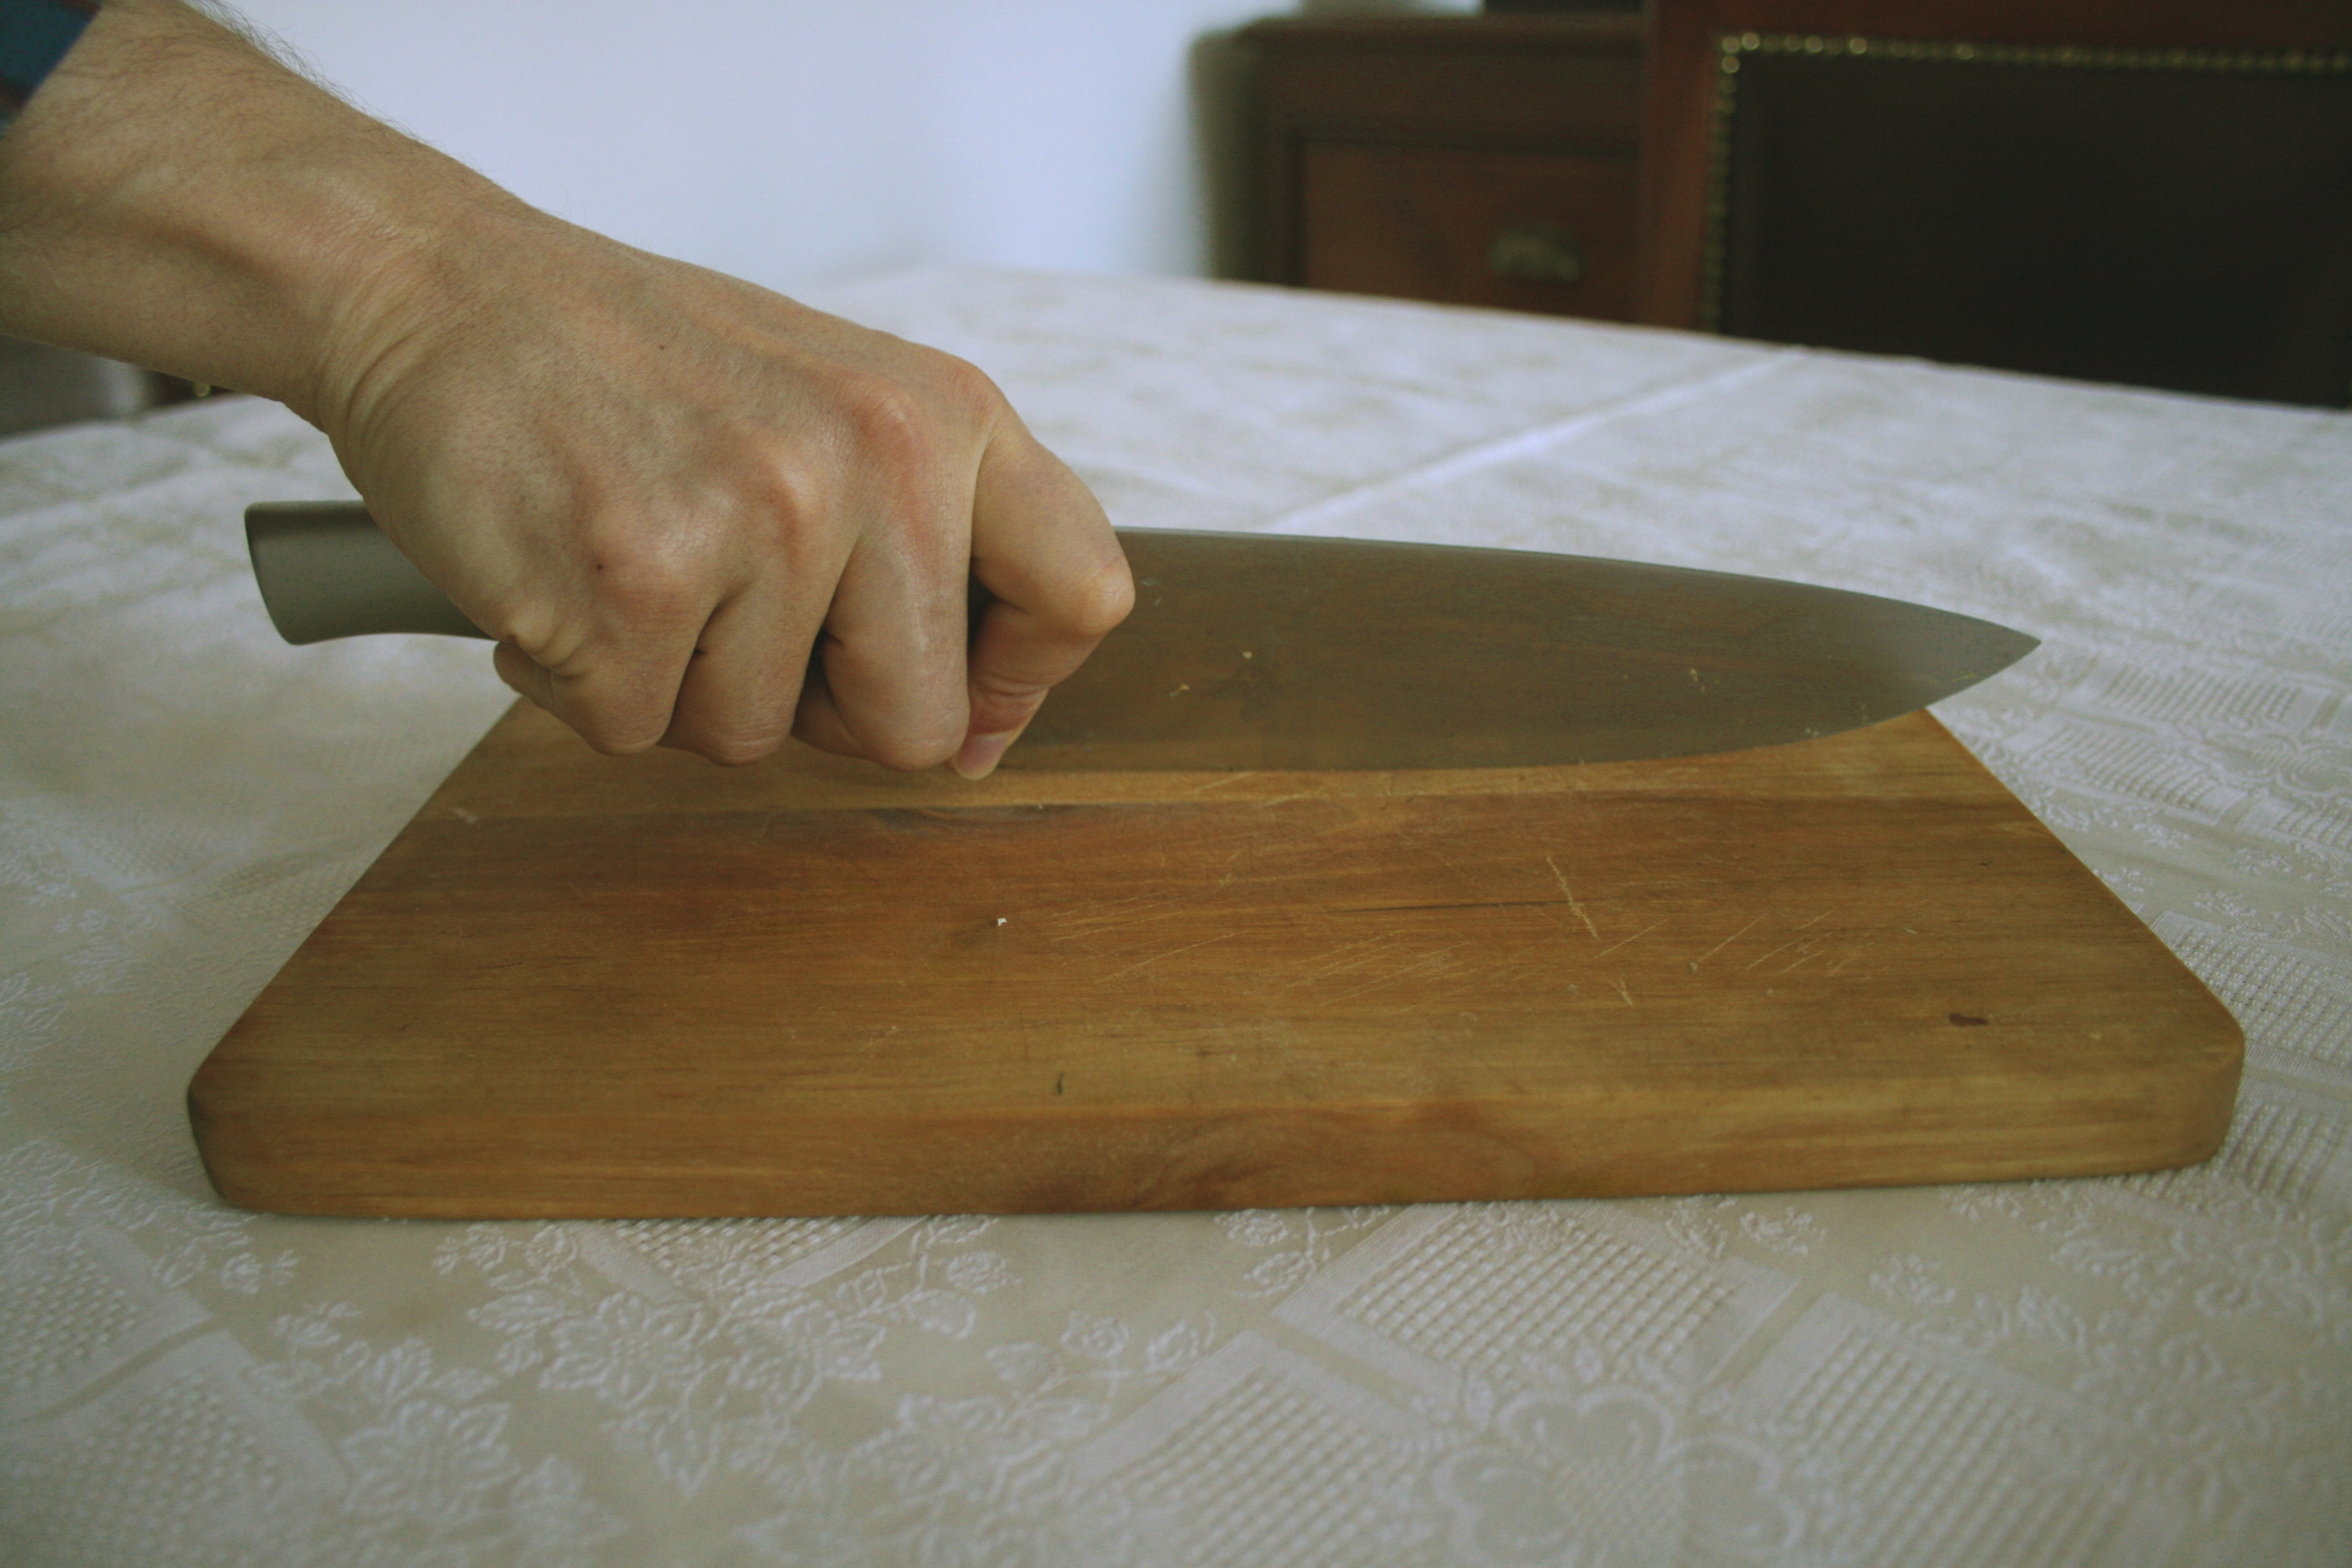 File cuchillo de cocina agarre jpg wikimedia commons for Cuchillos cocina